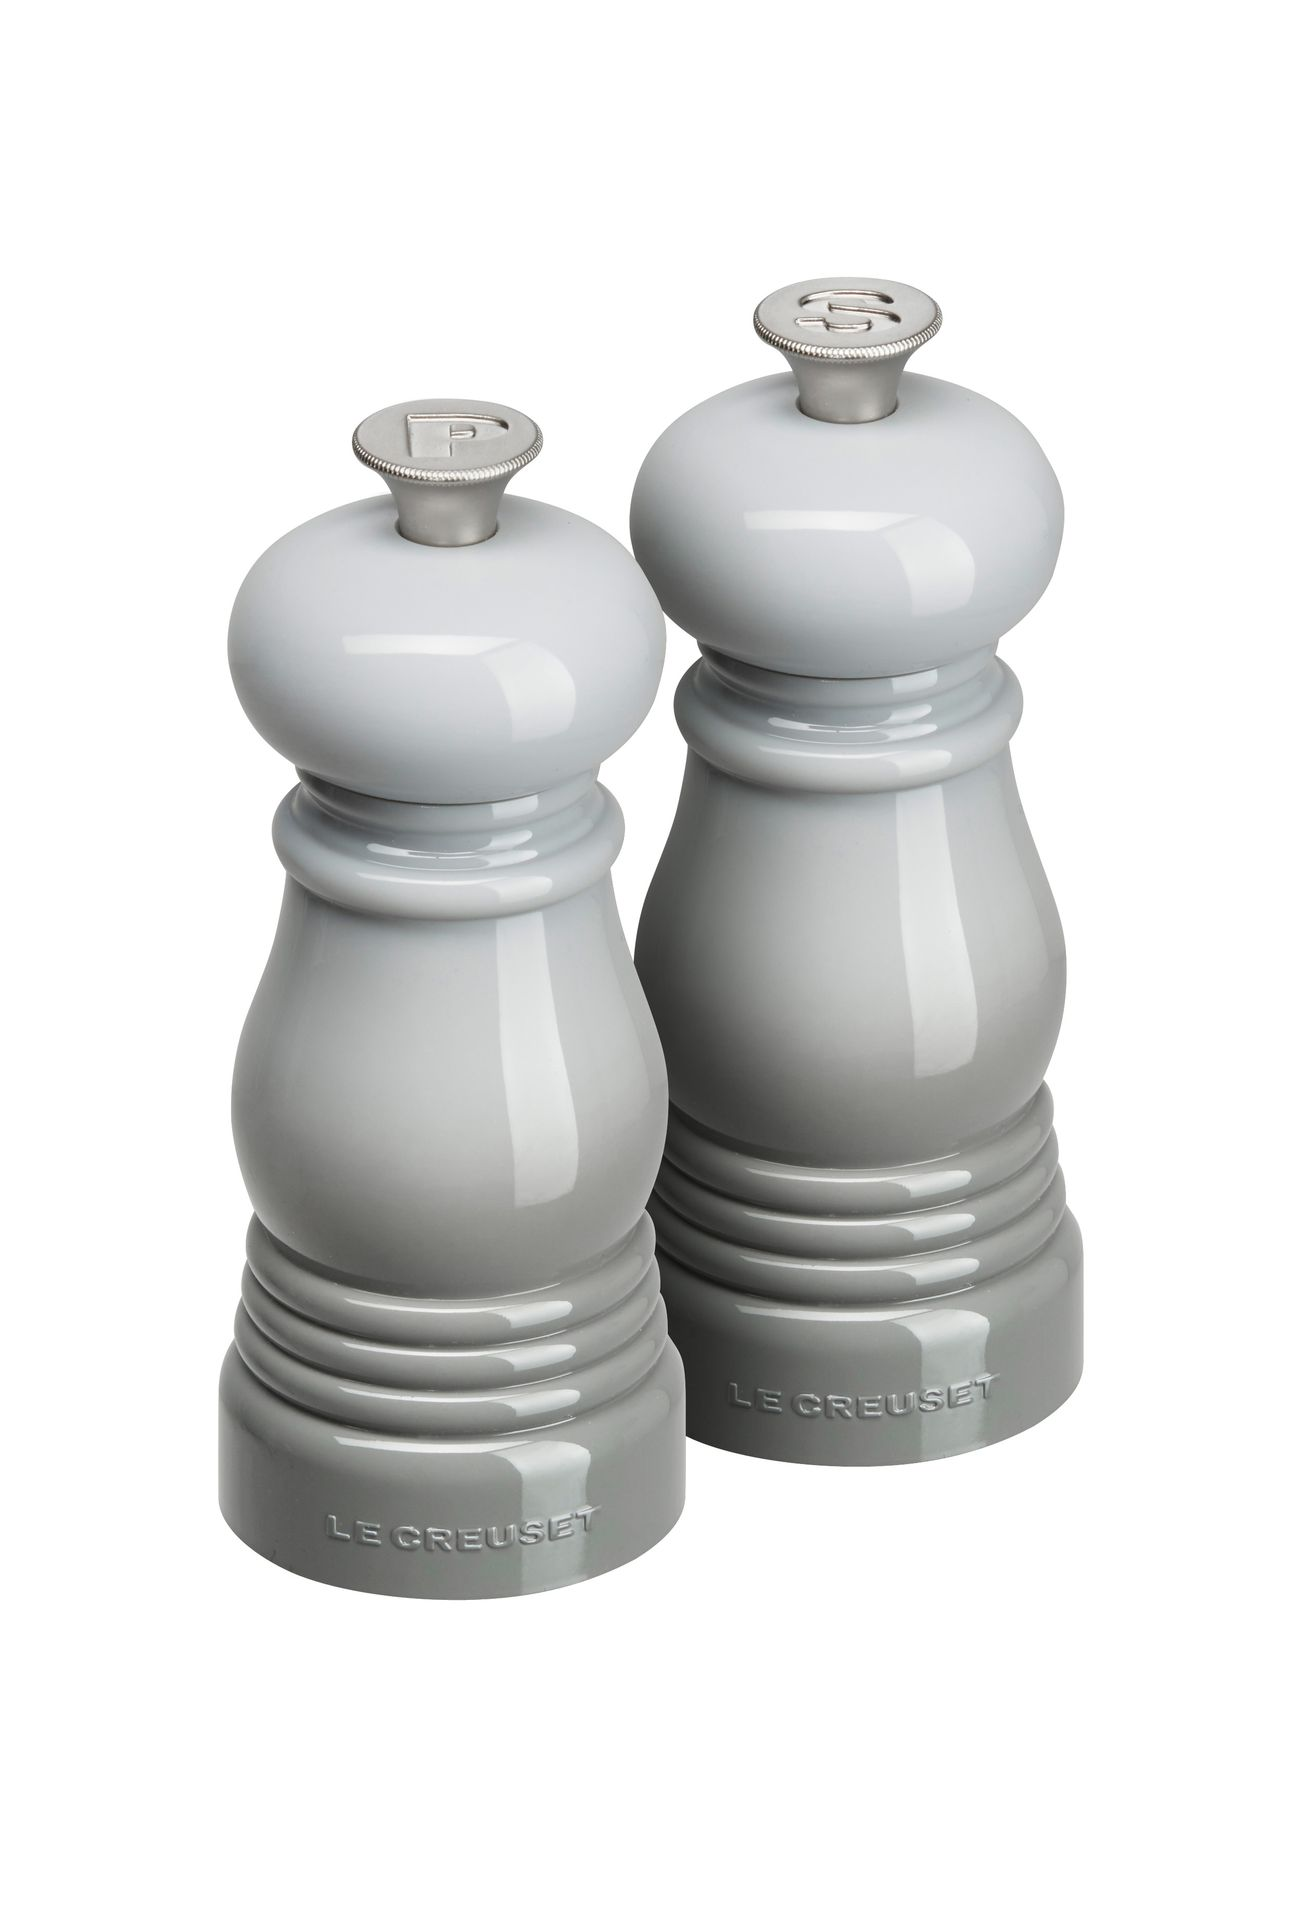 Le Creuset Mühlen-Set Klein Perlgrau 11 cm